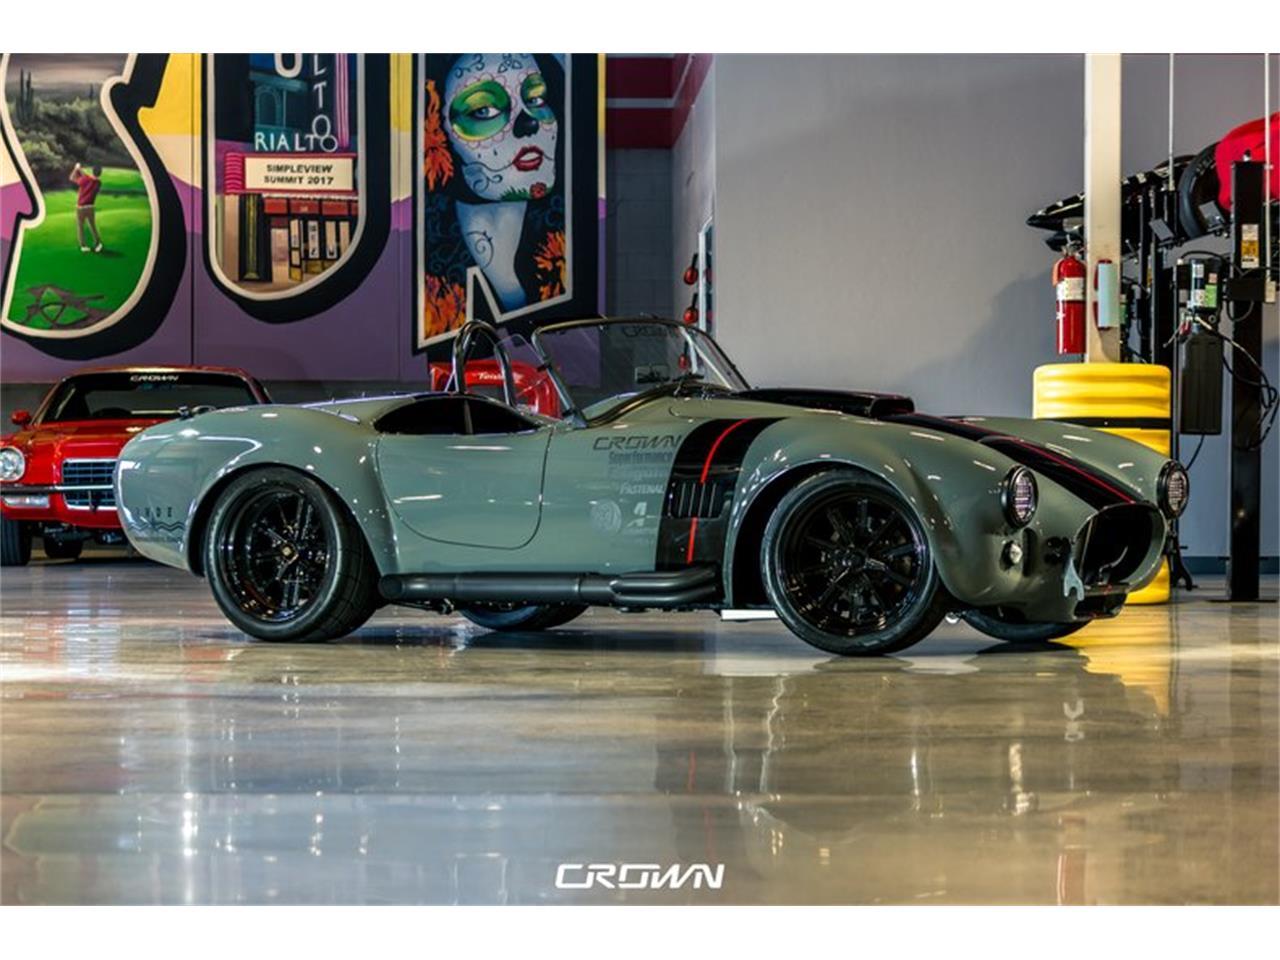 1965 Superformance MKI (CC-1237011) for sale in Tucson, Arizona